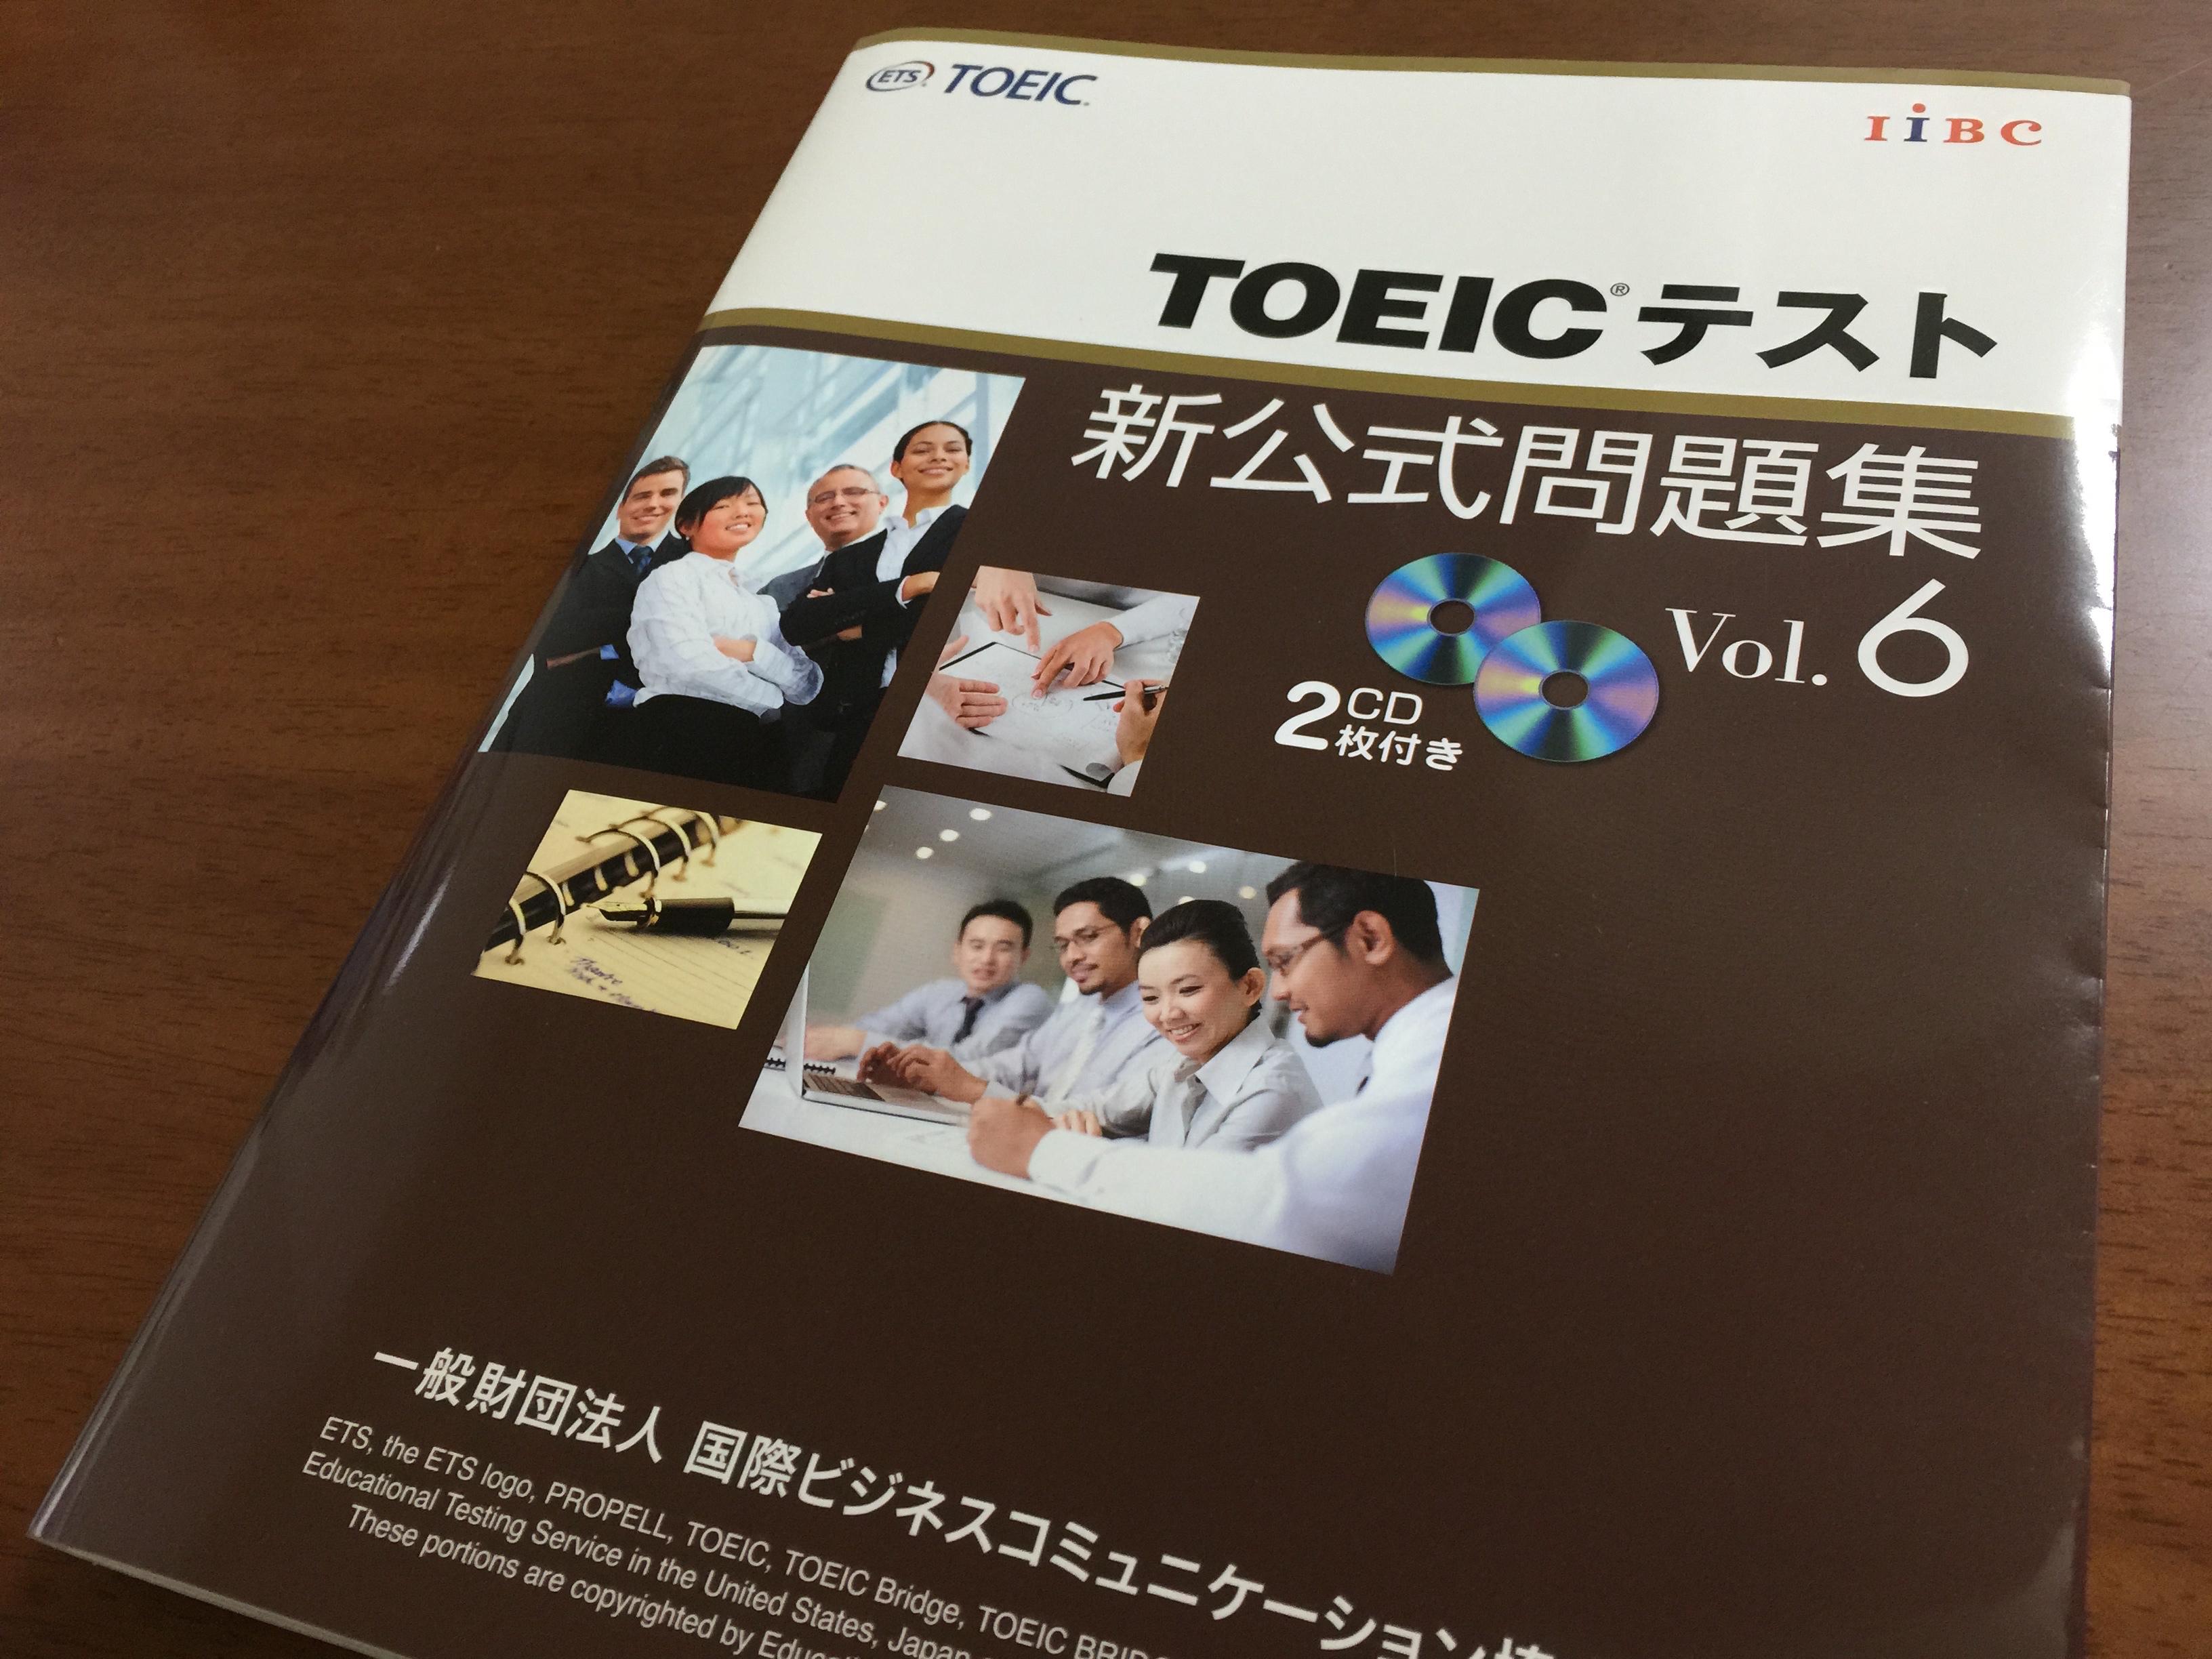 「TOEIC®新公式問題集 Vol.6」の感想・レビュー (2)